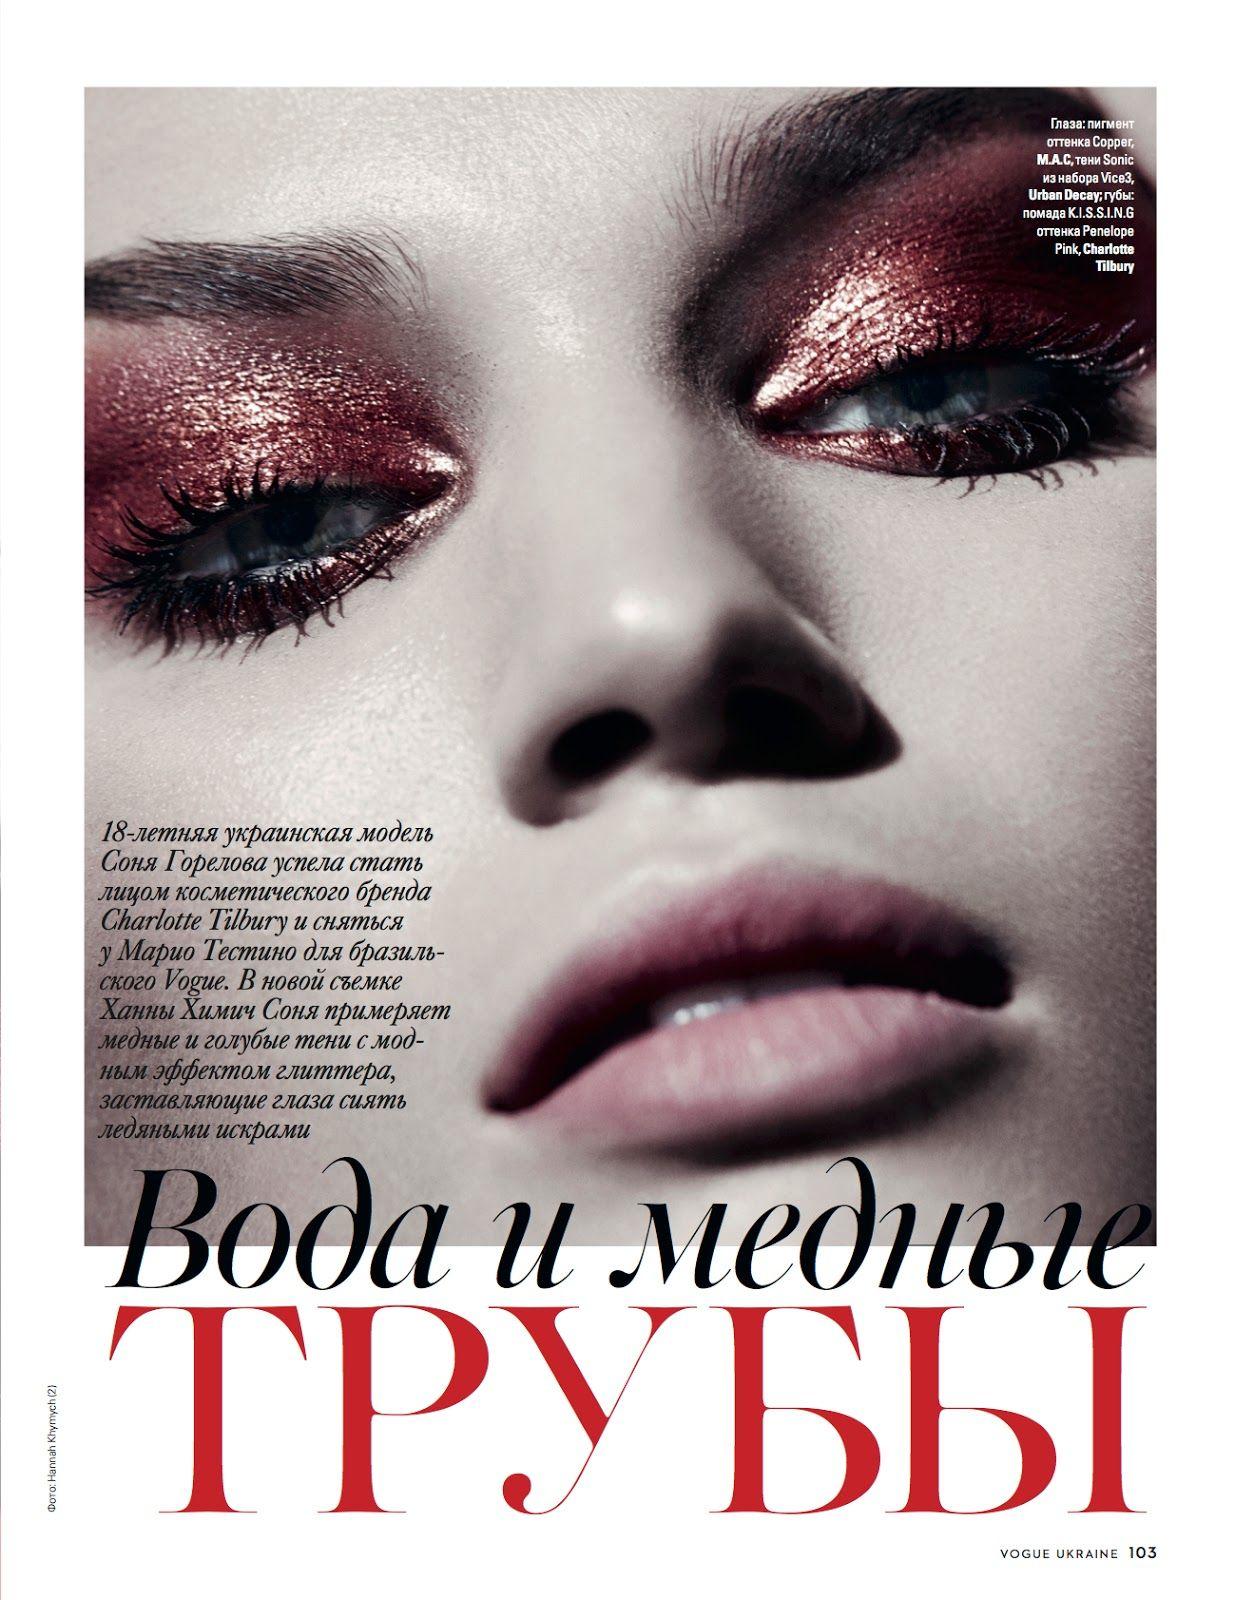 Communication on this topic: Nicola Parry, sonya-gorelova-ukr/